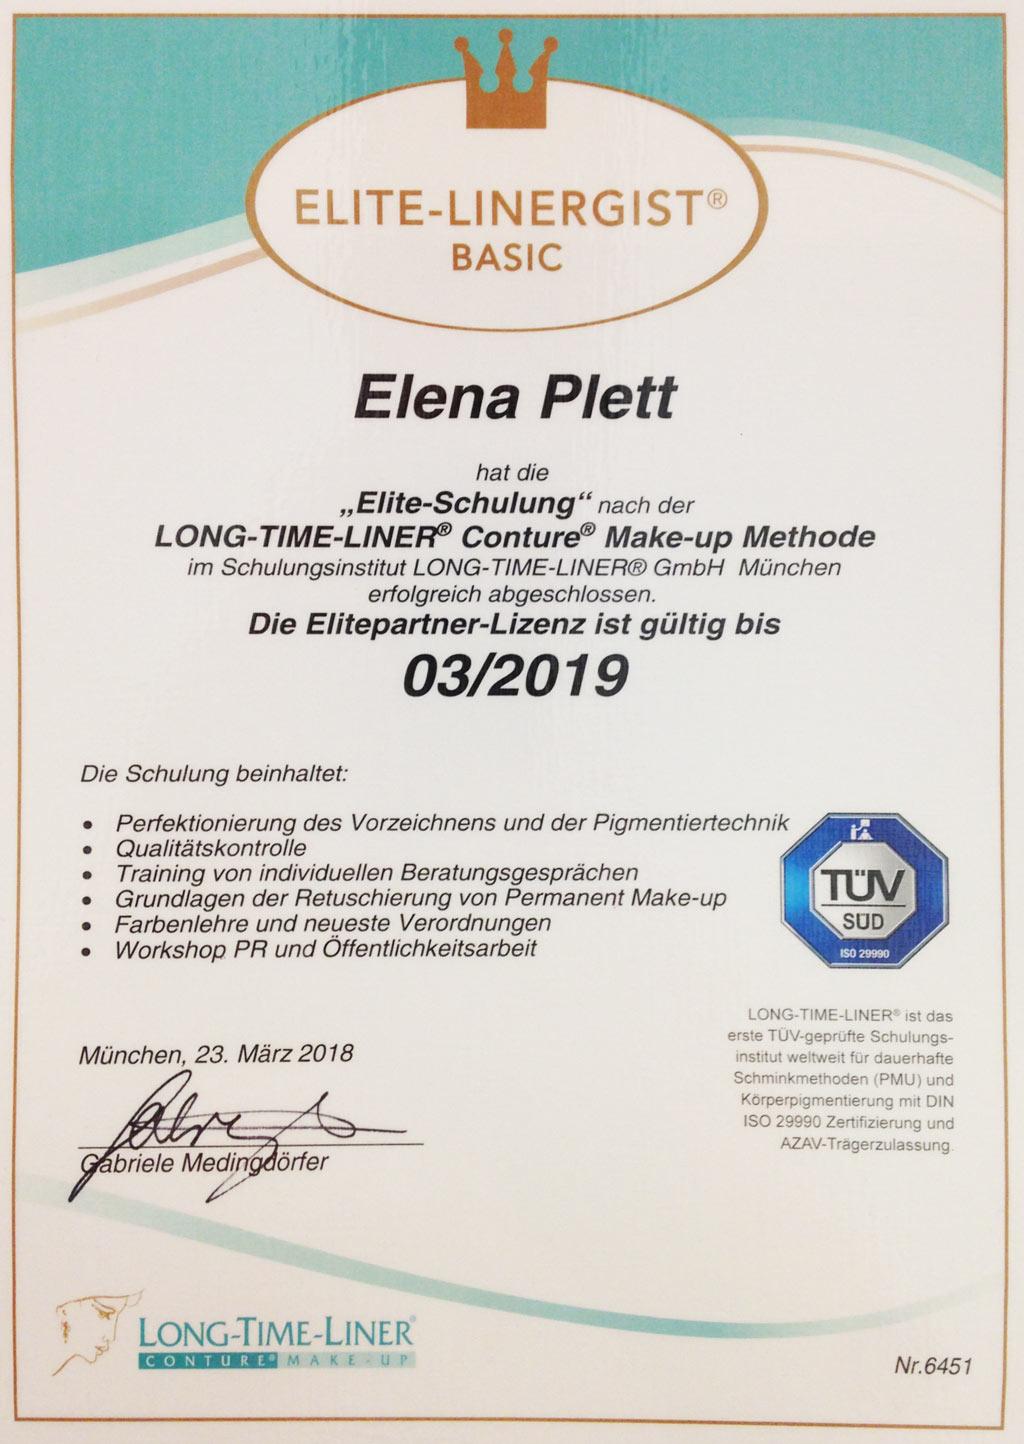 Zertifikat Elite-Schulung nach der LONG-TIME-LINER® Conture® Make-up Methode